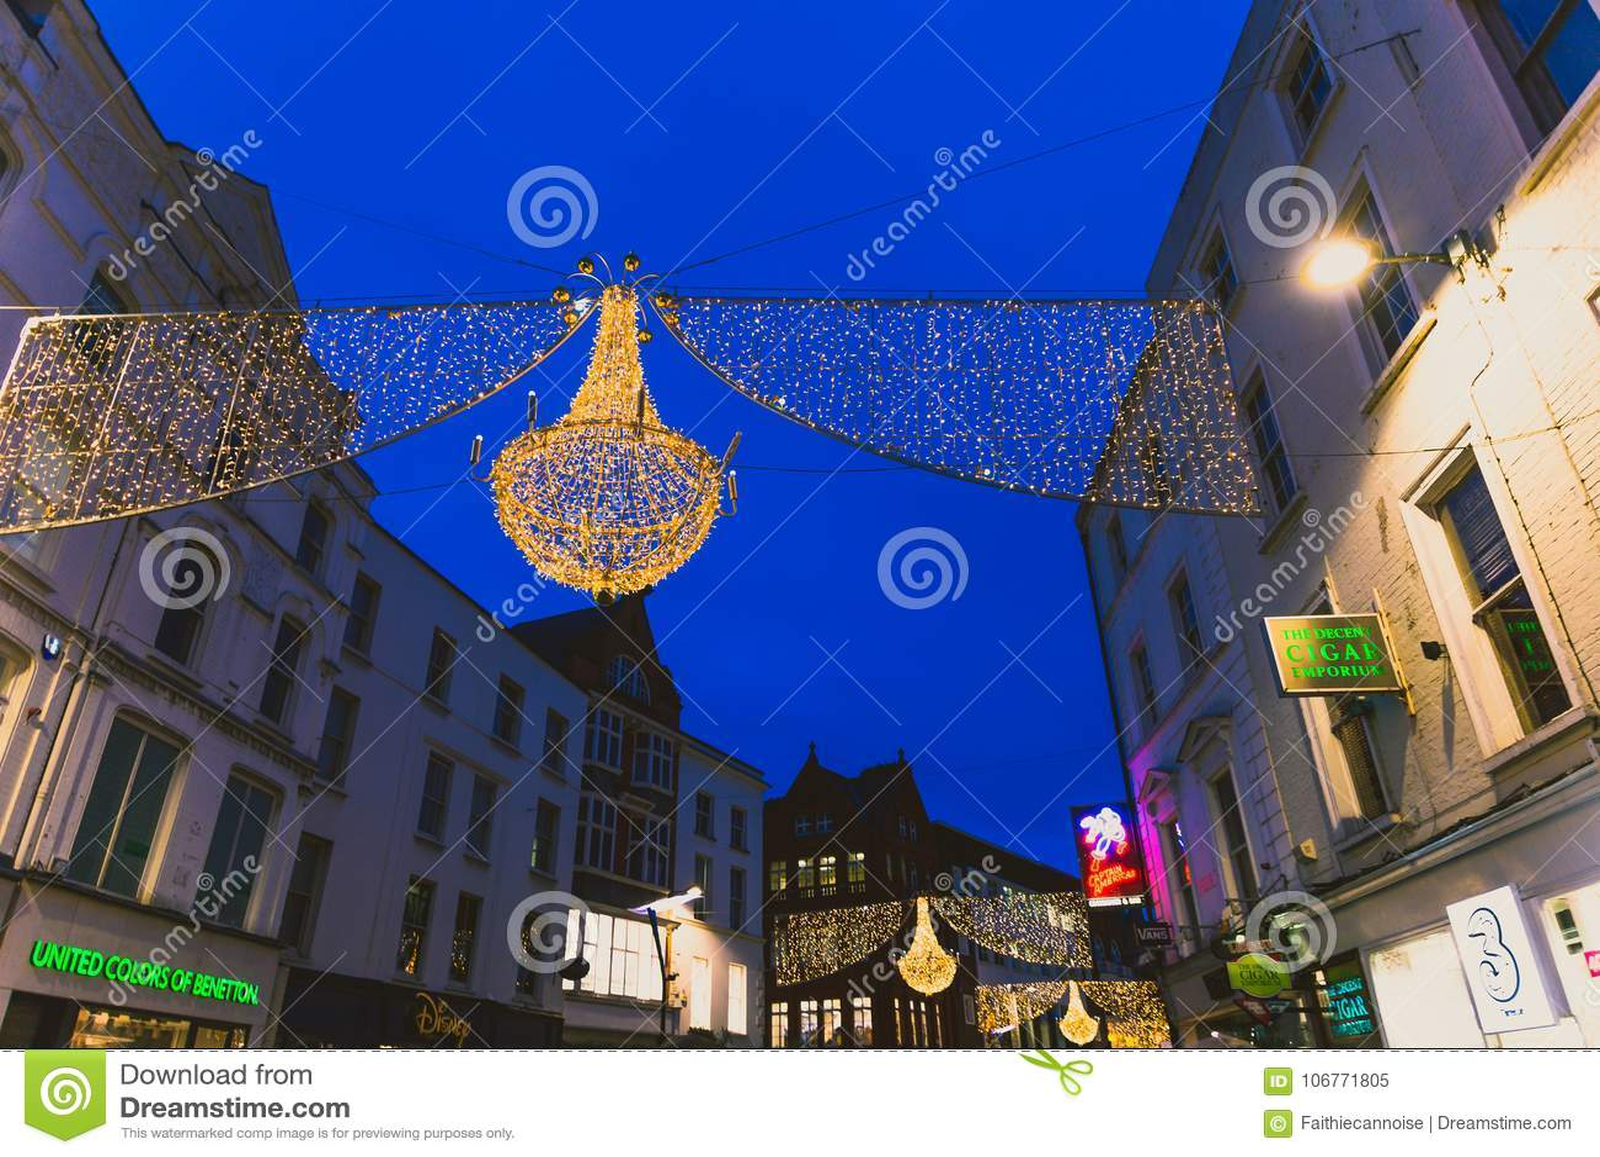 f68e6ffffa Christmas Lights Adorning The Famous Shopping Area Of Grafton St ...